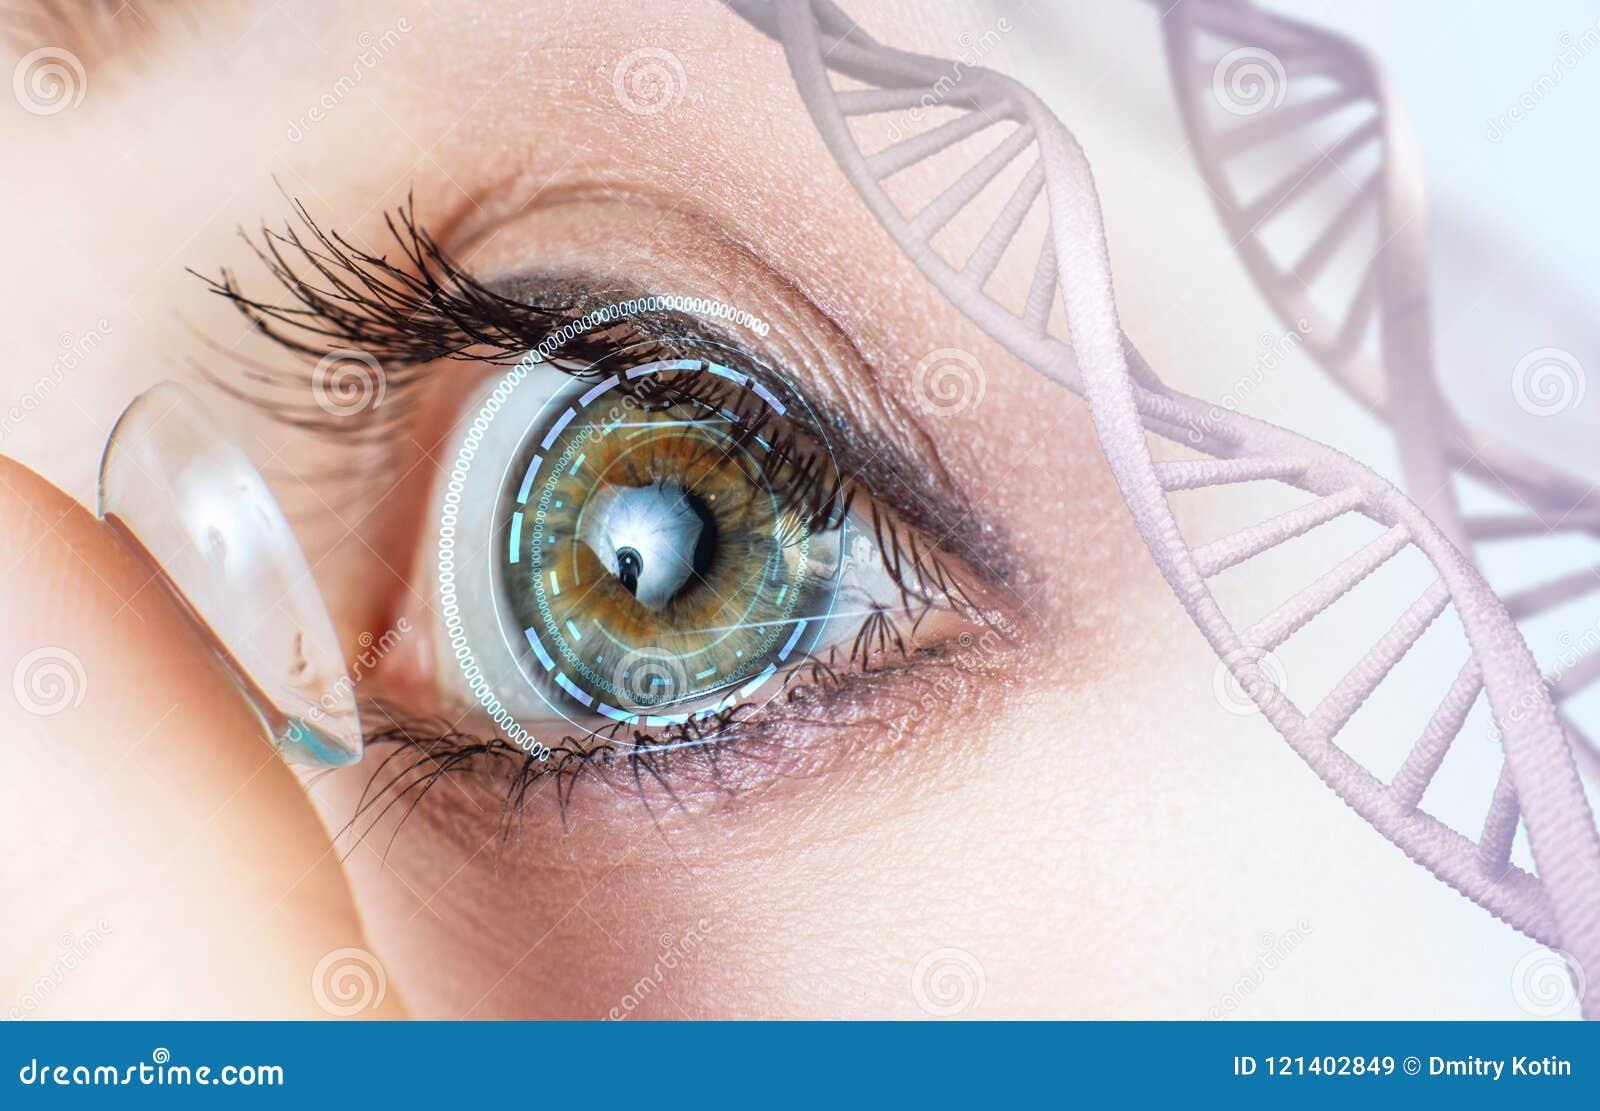 Verre de contact de port de femme parmi des tiges d ADN